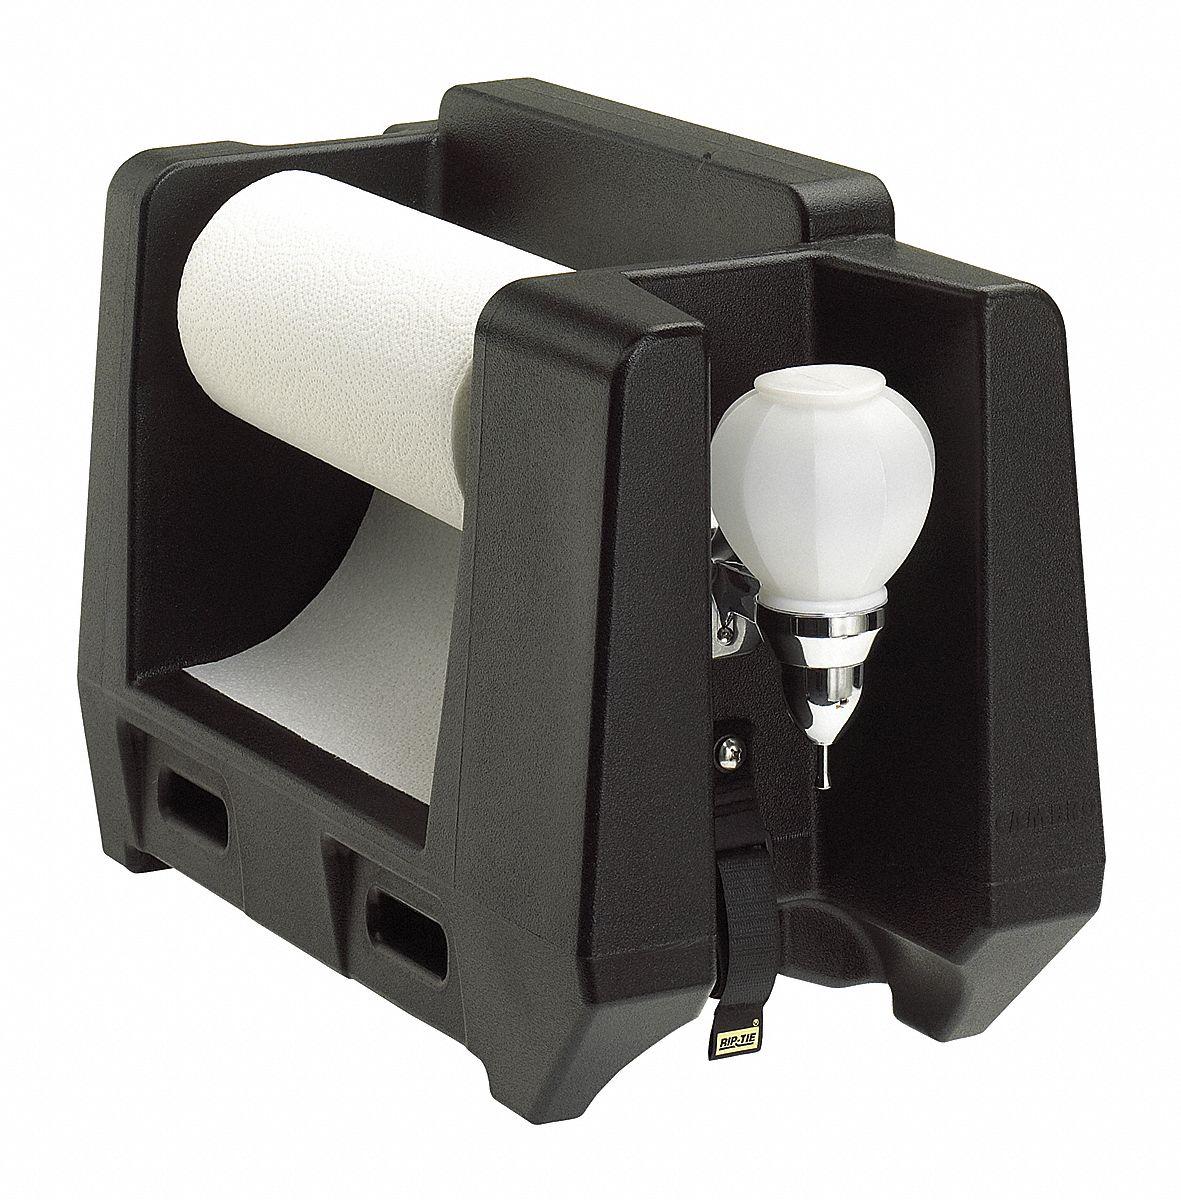 Cambro Paper Towel And Soap Dispenser Black 22nv23 Eahwapr110 Grainger